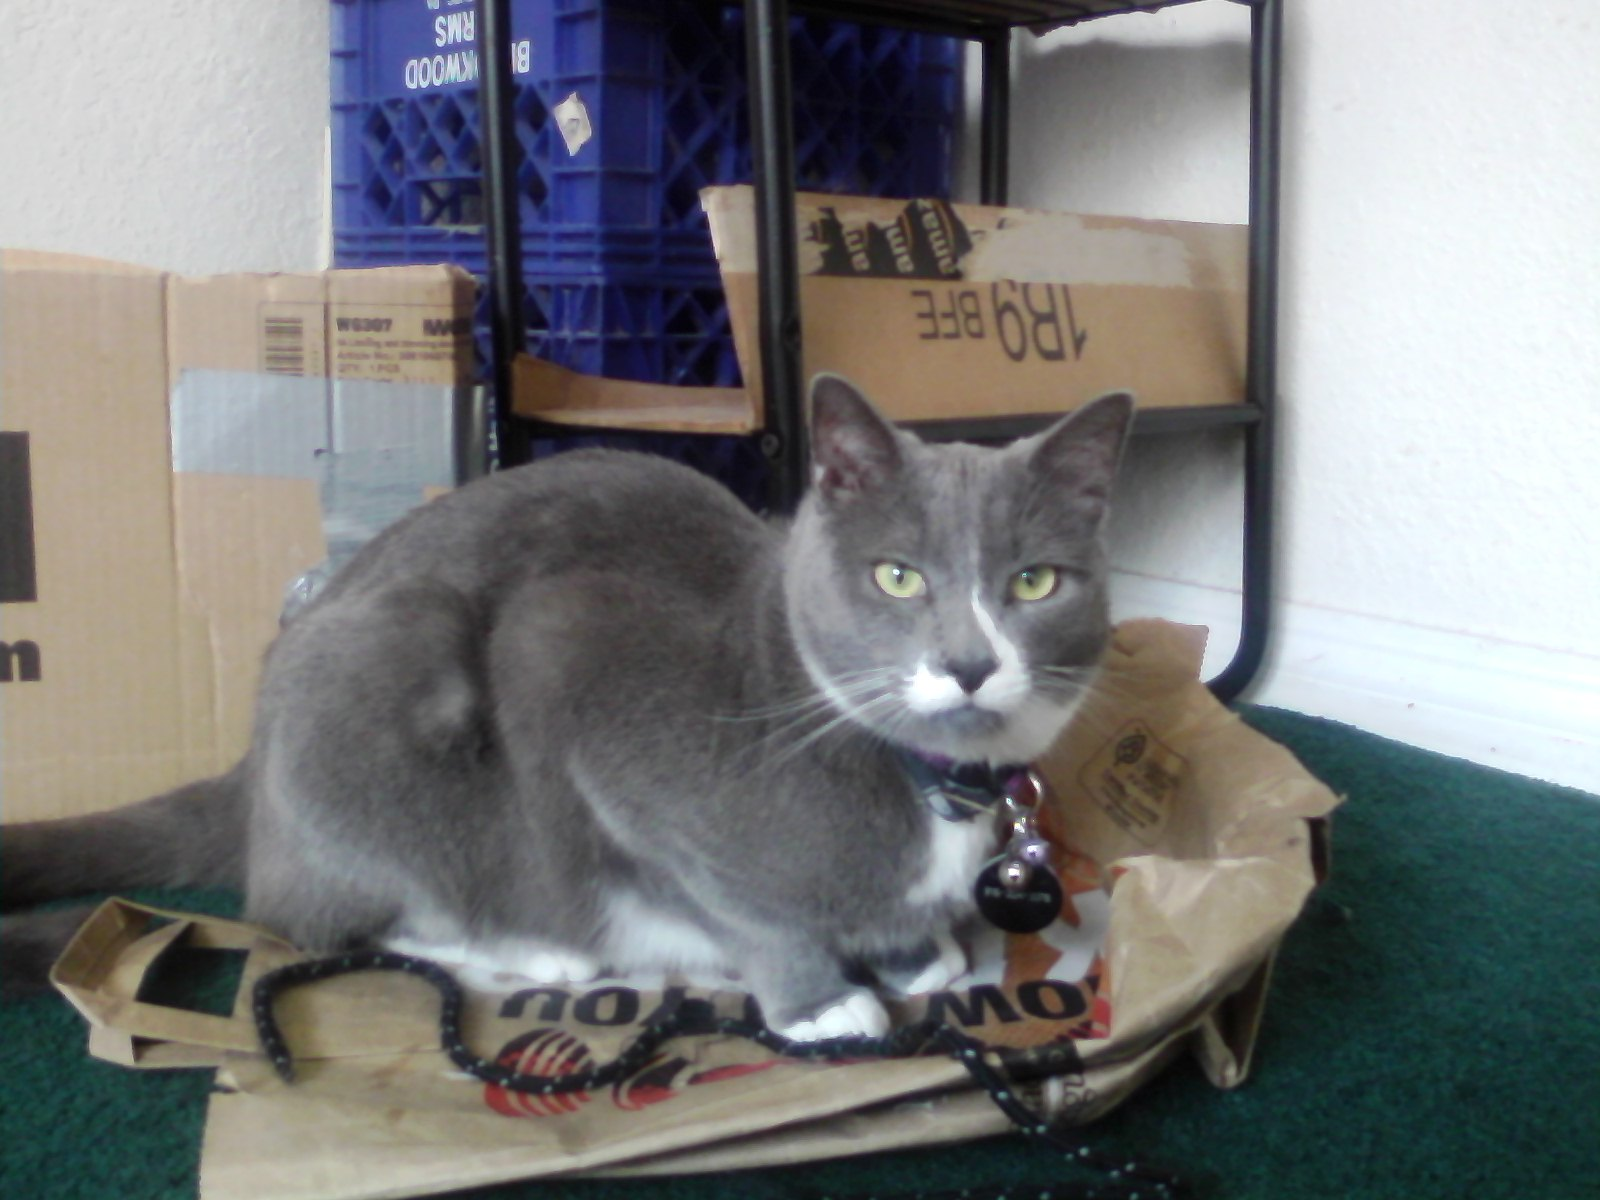 American Ringtail Cat - PoC